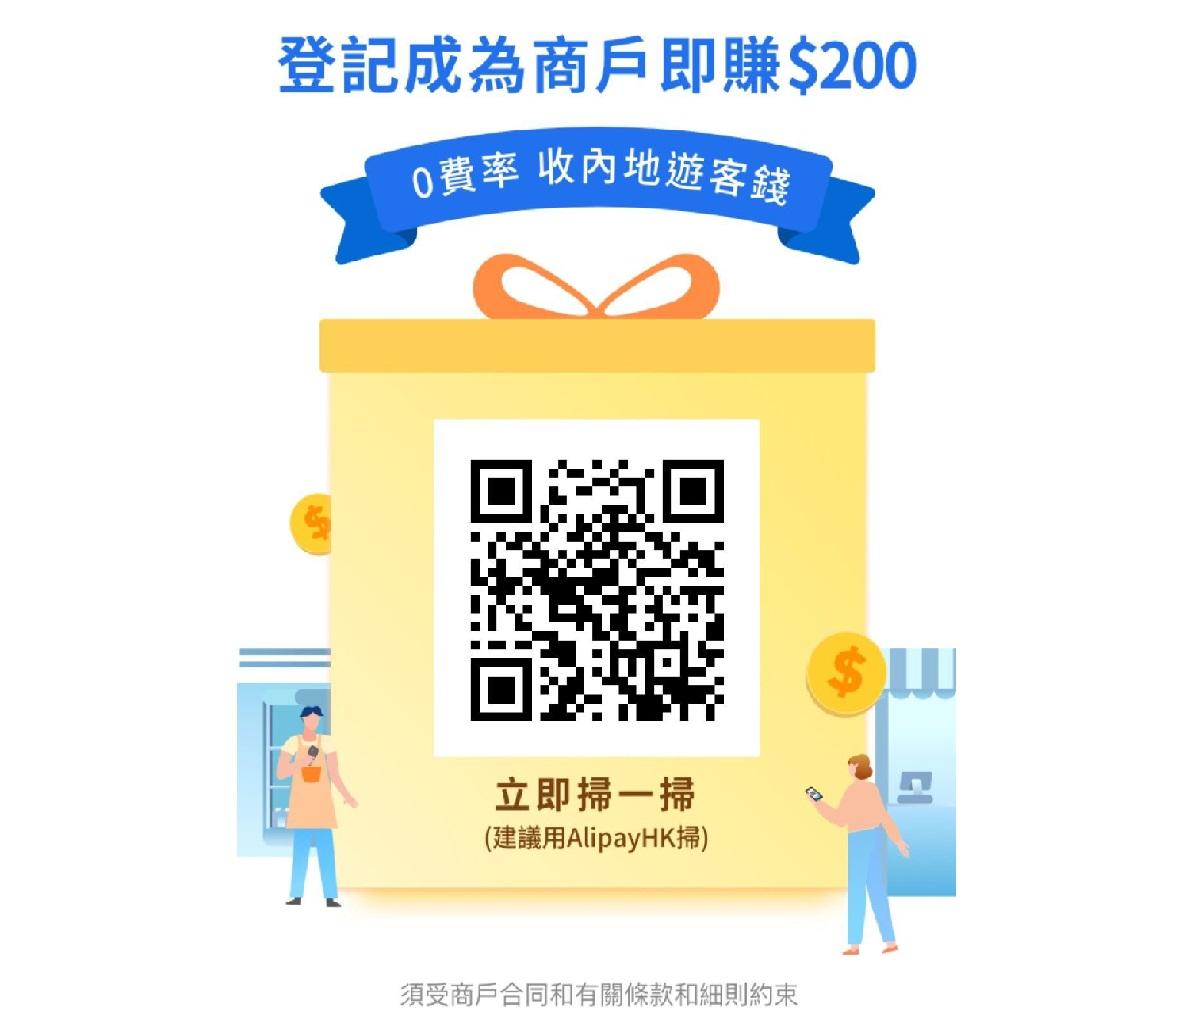 UPPERSHOP.HK 樓上舖 X Alipay HK 商戶申請優惠